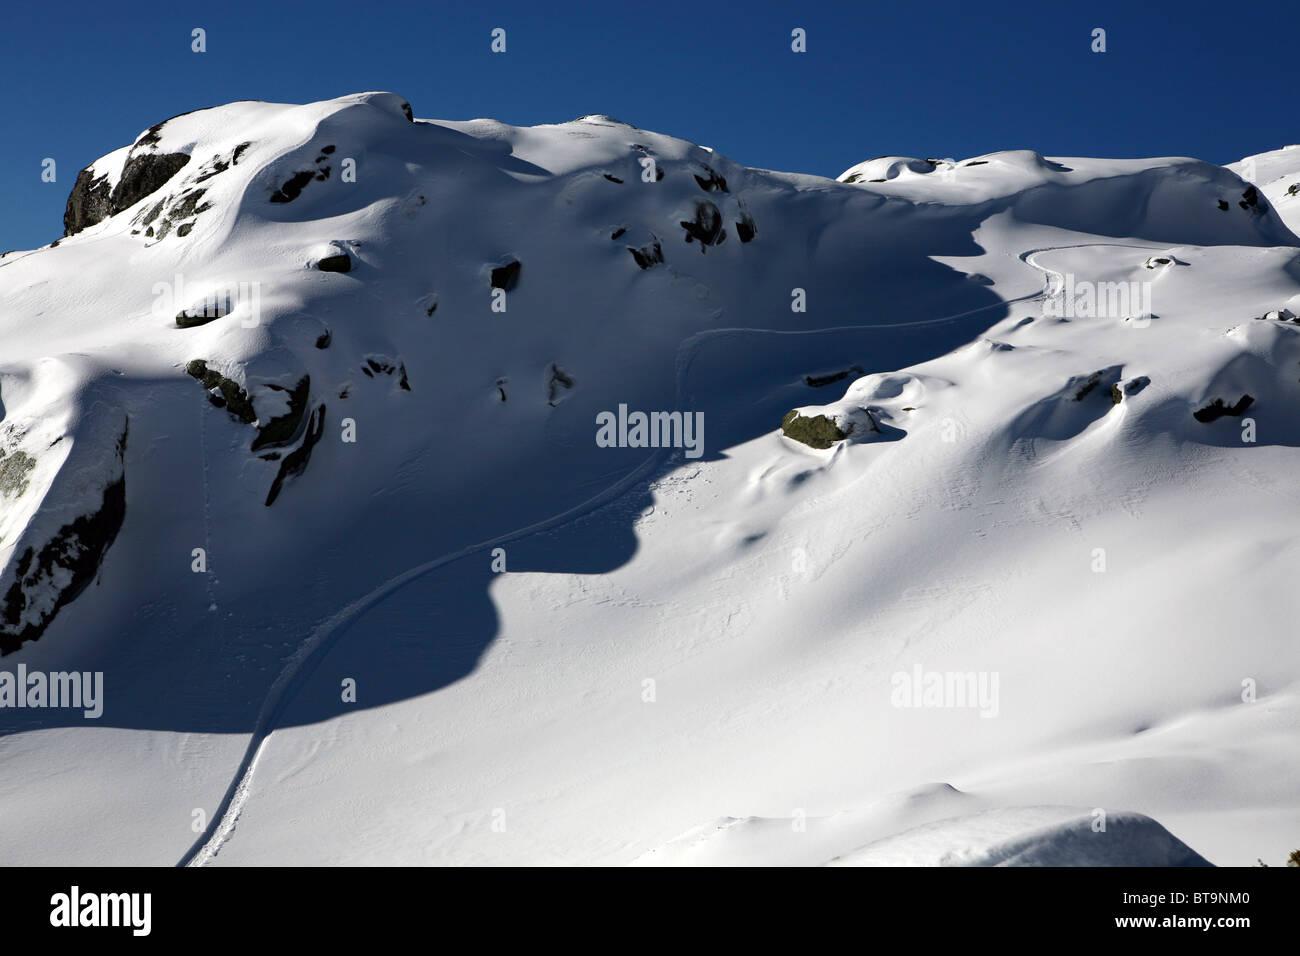 off piste snowboard trail line in powder snow in serra da estrela